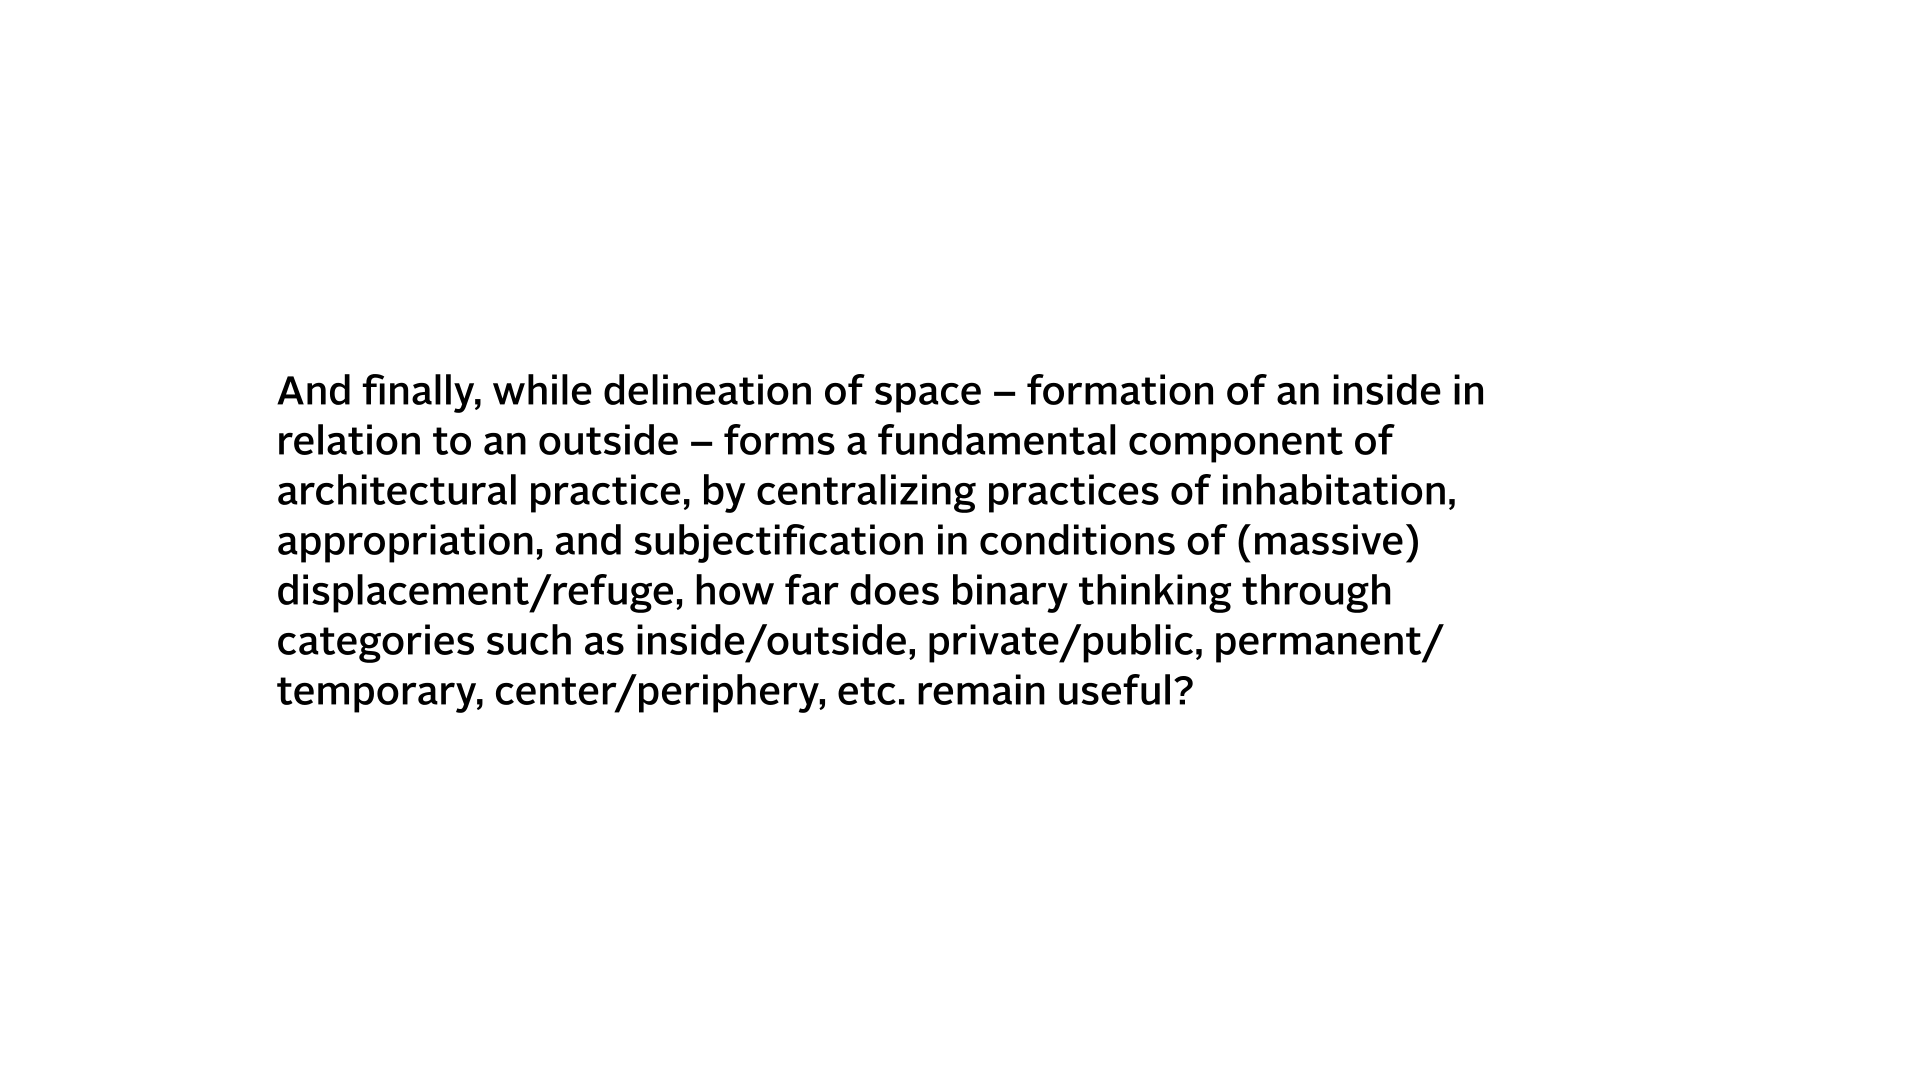 05_Concept_04